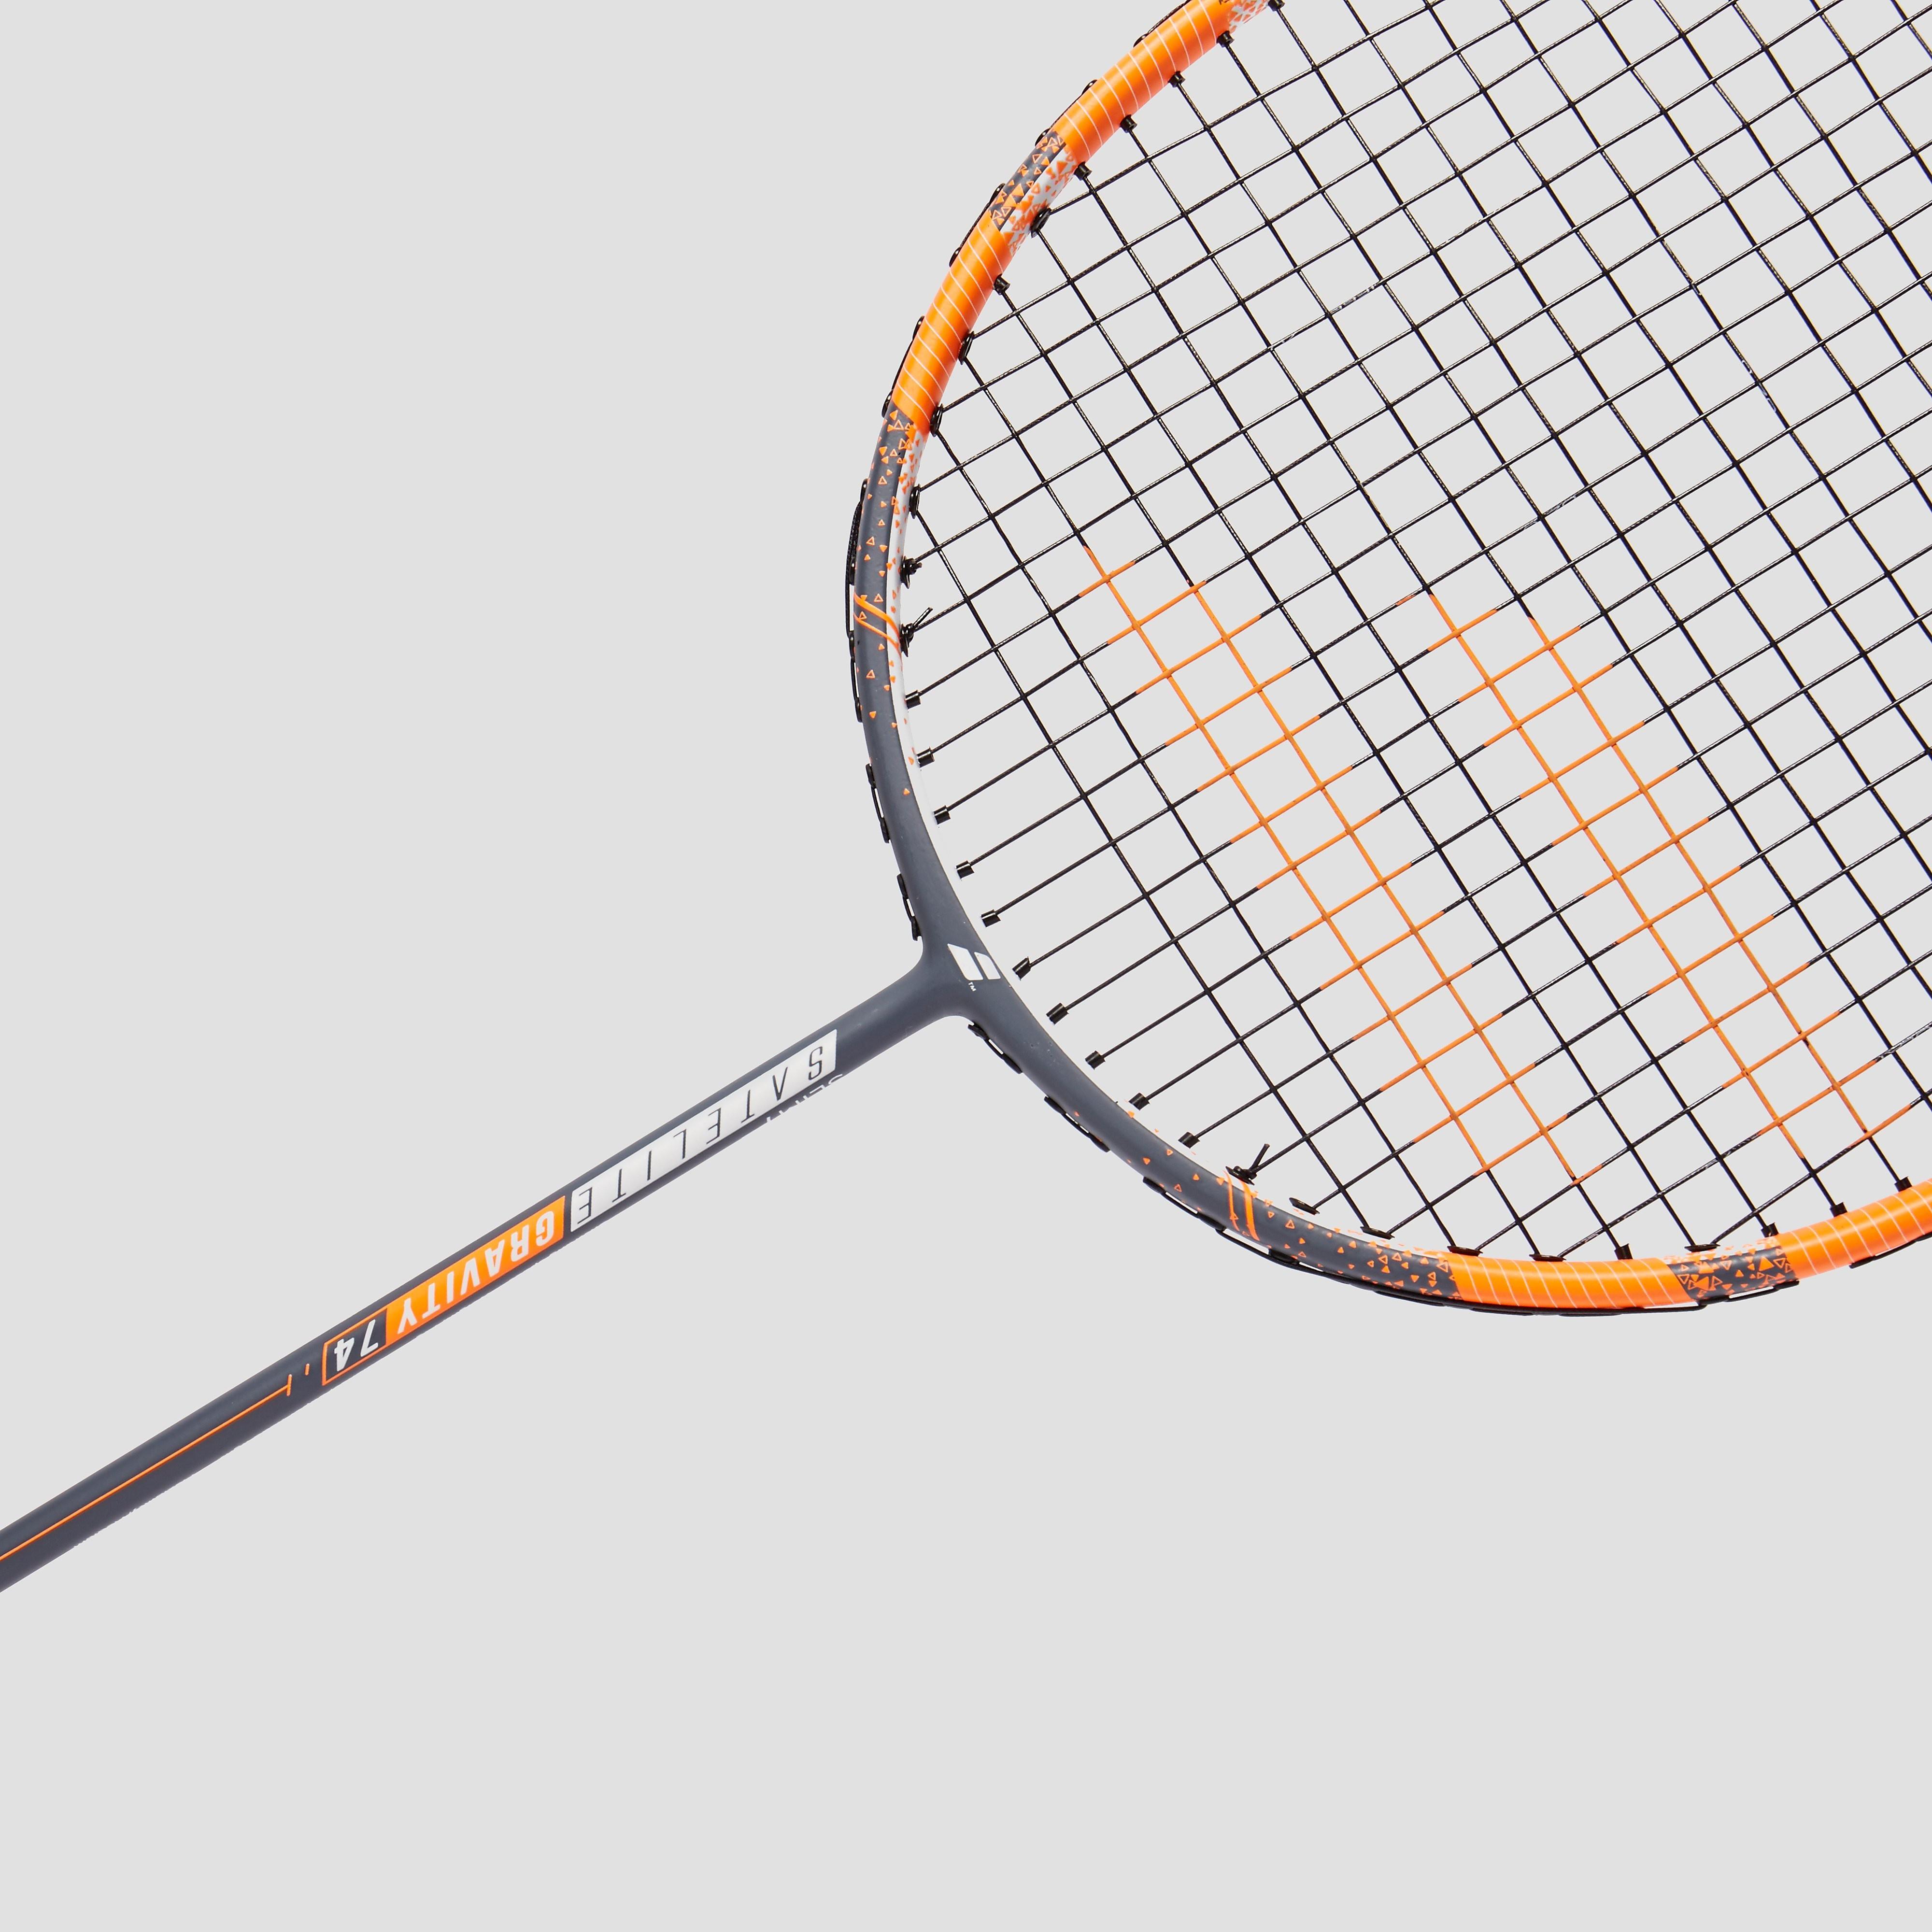 Babolat Satelite Gravity 74 Badminton Racket